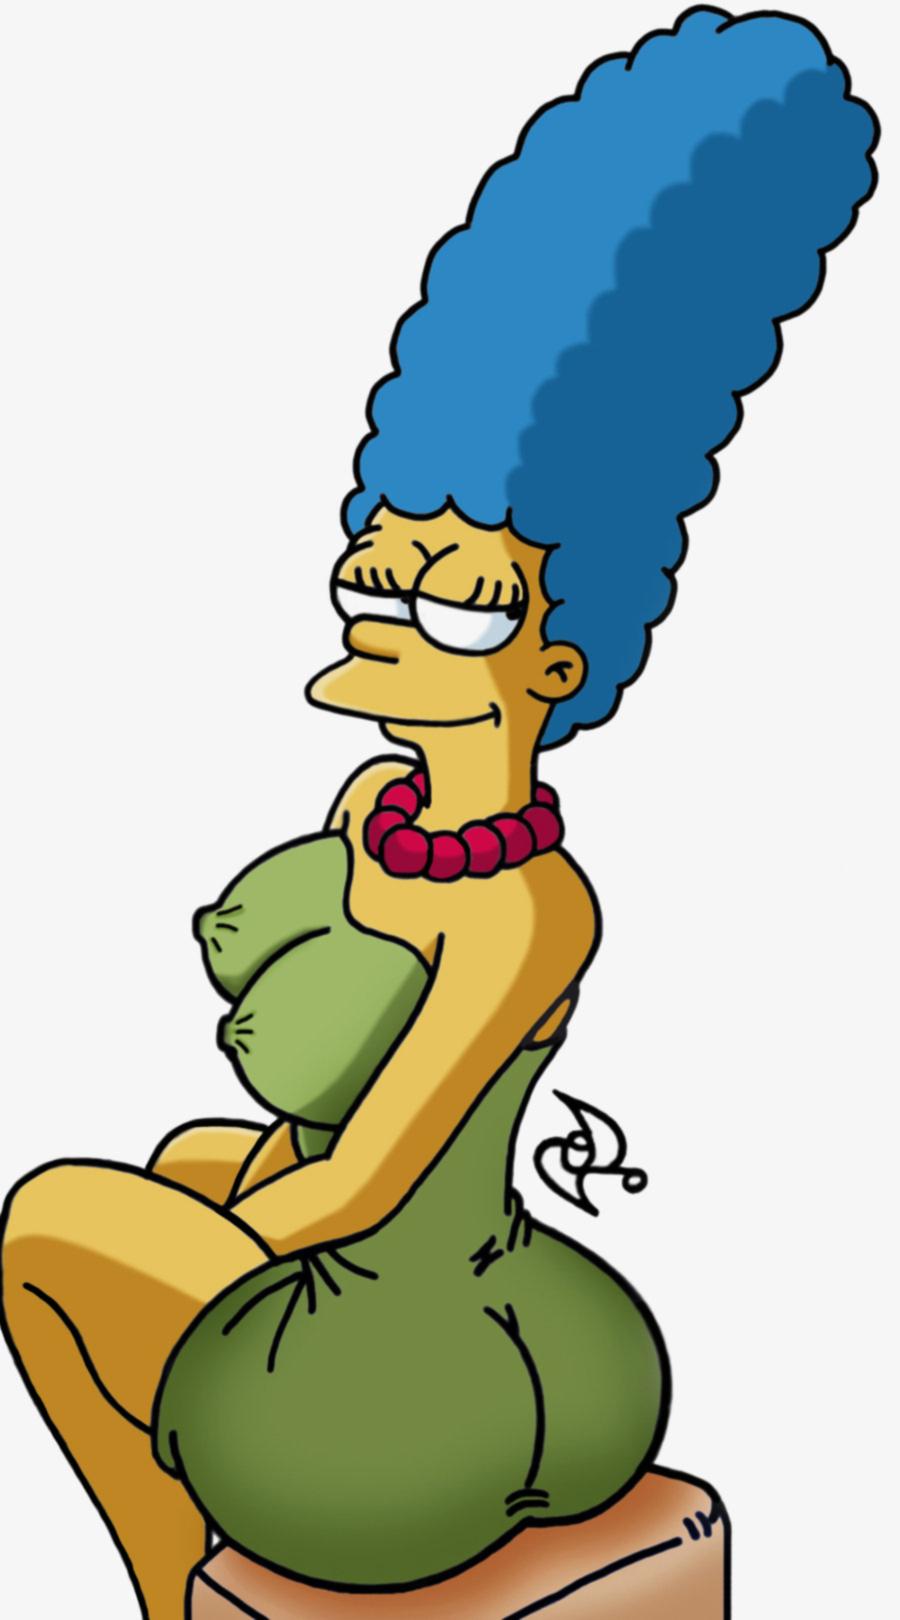 Marge Simpson by omar-sin on DeviantArt